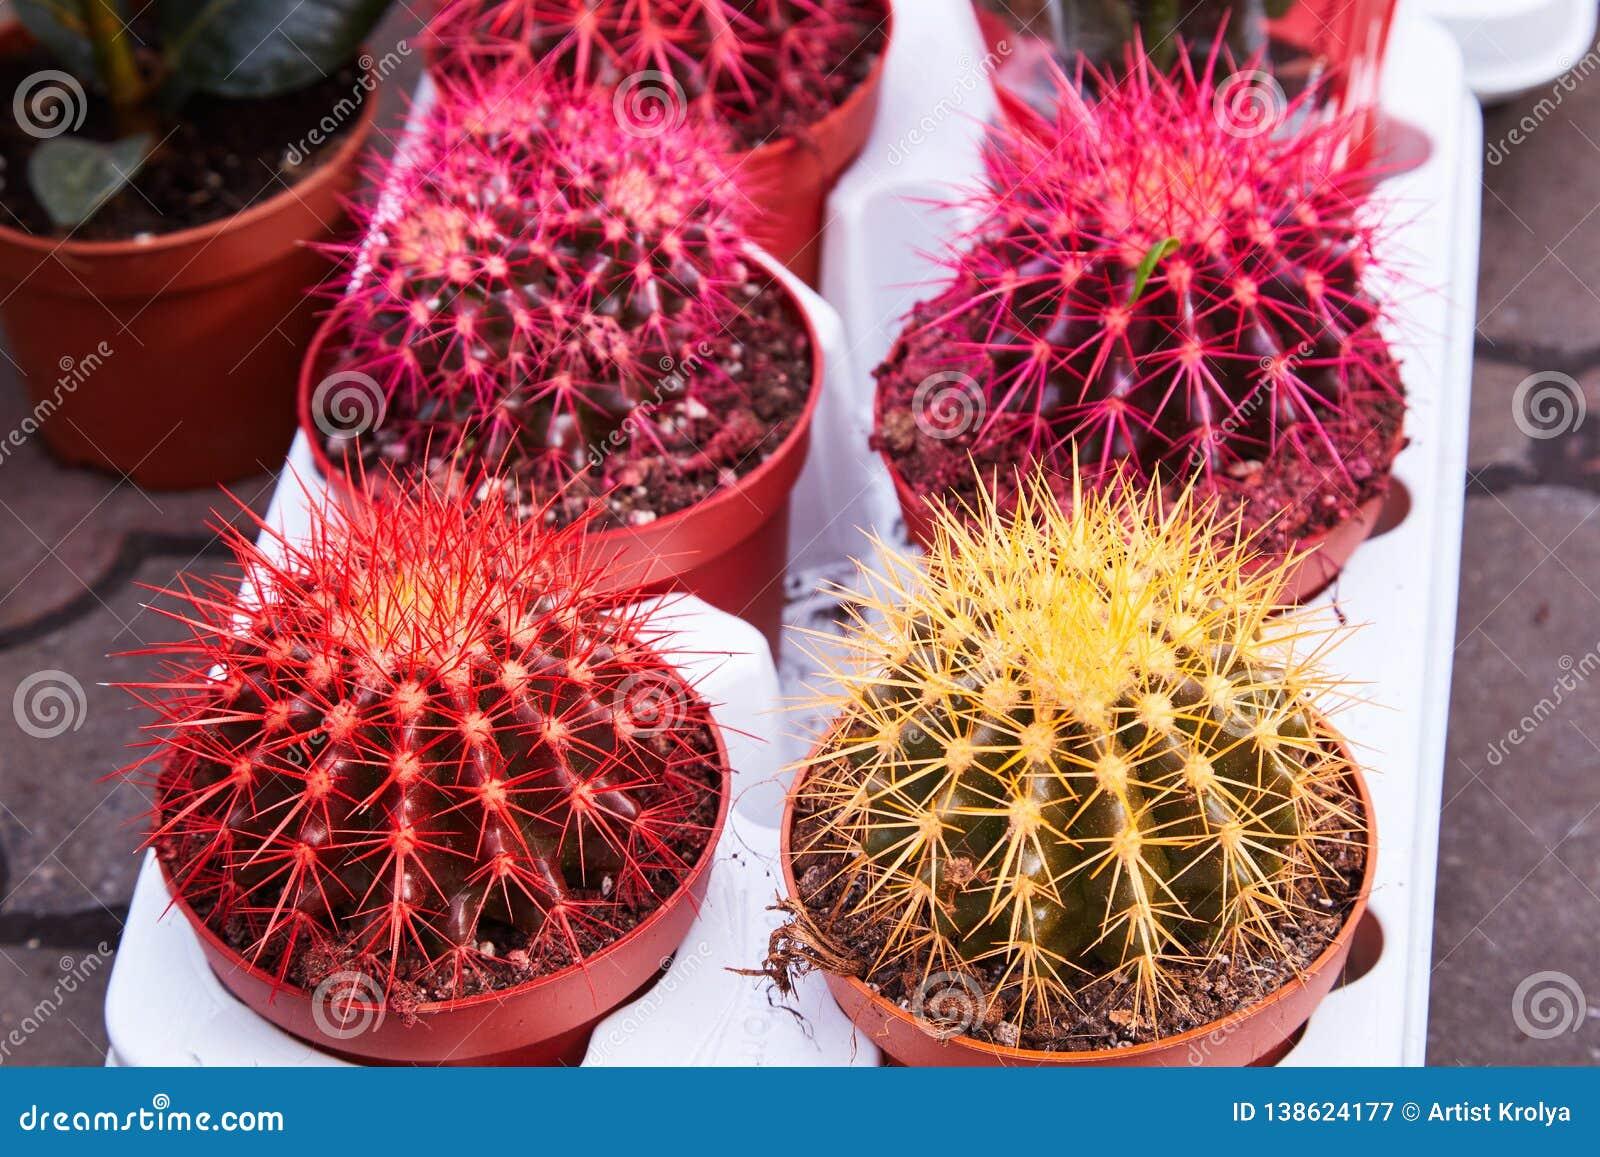 Golden Barrel Cactus, Echinocactus Grusonii Plant Stock ... on elephant plant, aloe vera plant, skin care stonecrop plant, variegated jade plant, peperomia house plant, purple rose succulent plant, rainbow fern house plant,